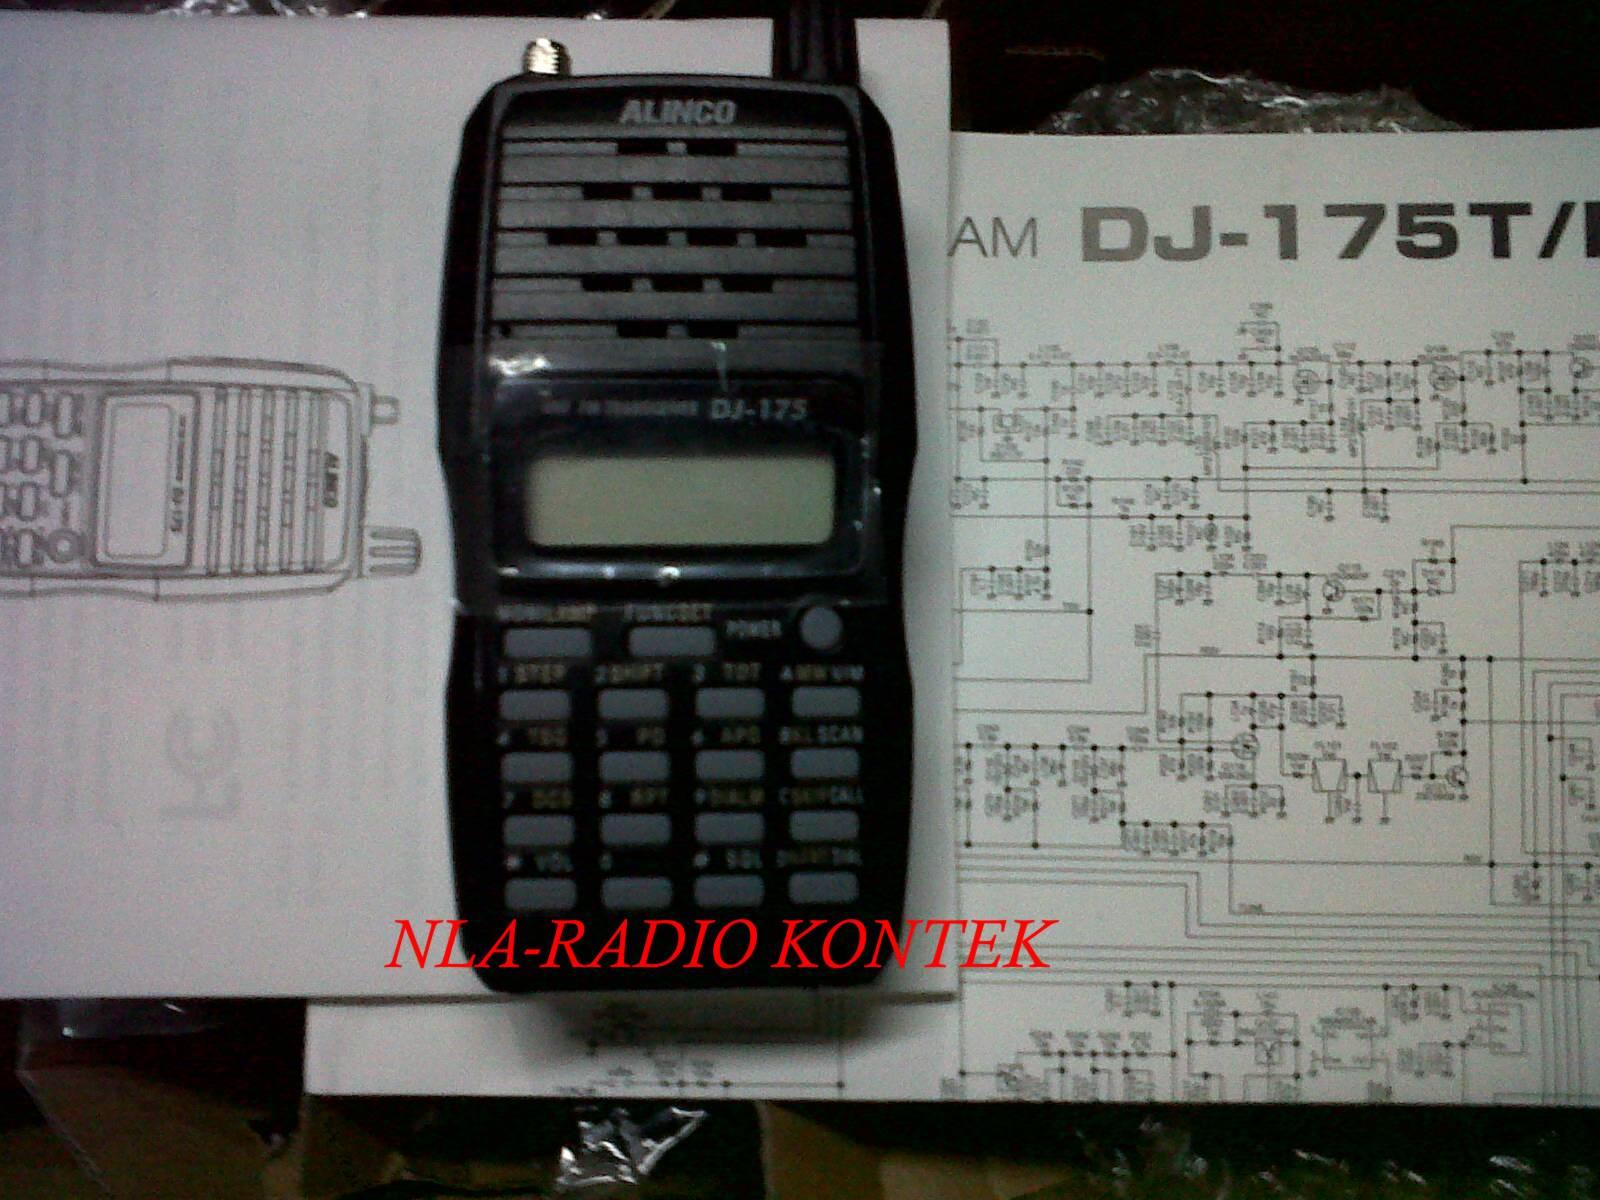 Radio Kontek